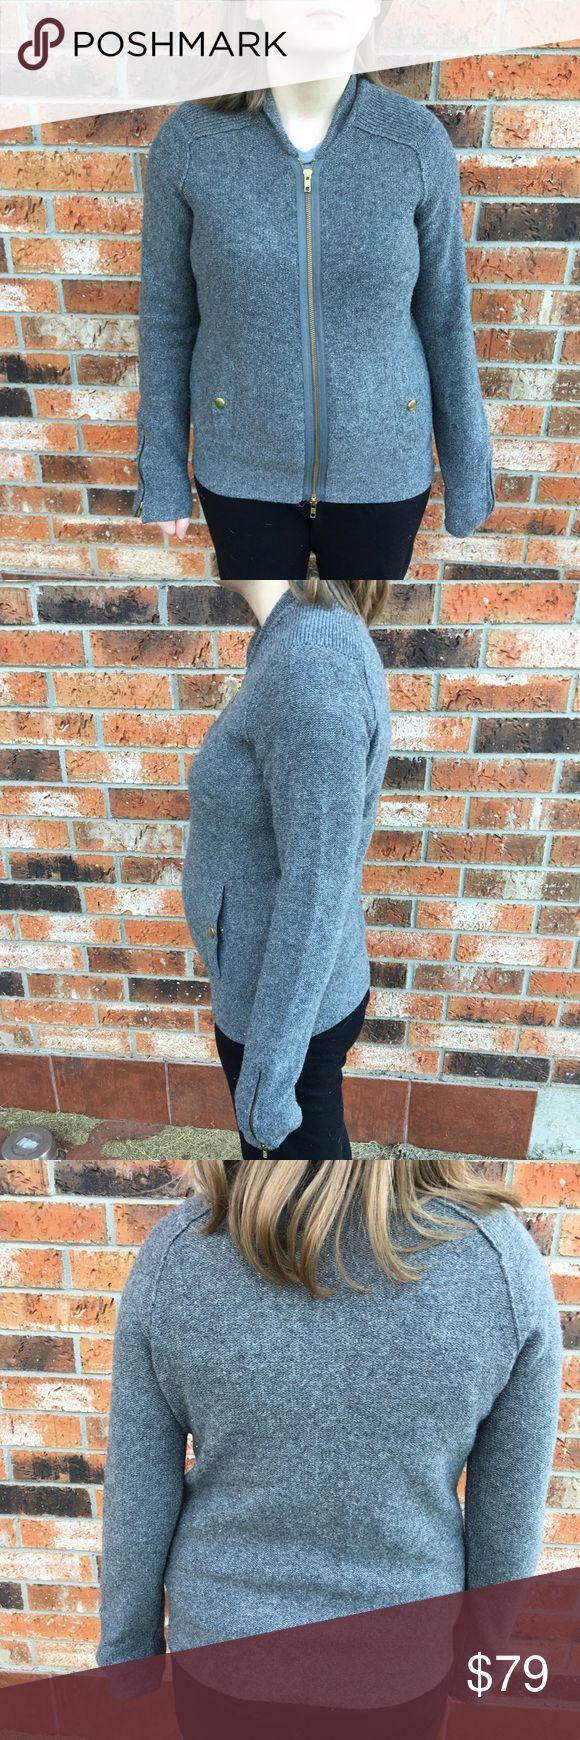 "J. Crew gilded sweater jacket Women's Small J. Crew gilded sweater jacket Women's Small 19"" arm pit to arm pit. 22"" length. 95% merino wool 5 % metallic. Great Condition. J. Crew Tops Sweatshirts & Hoodies"